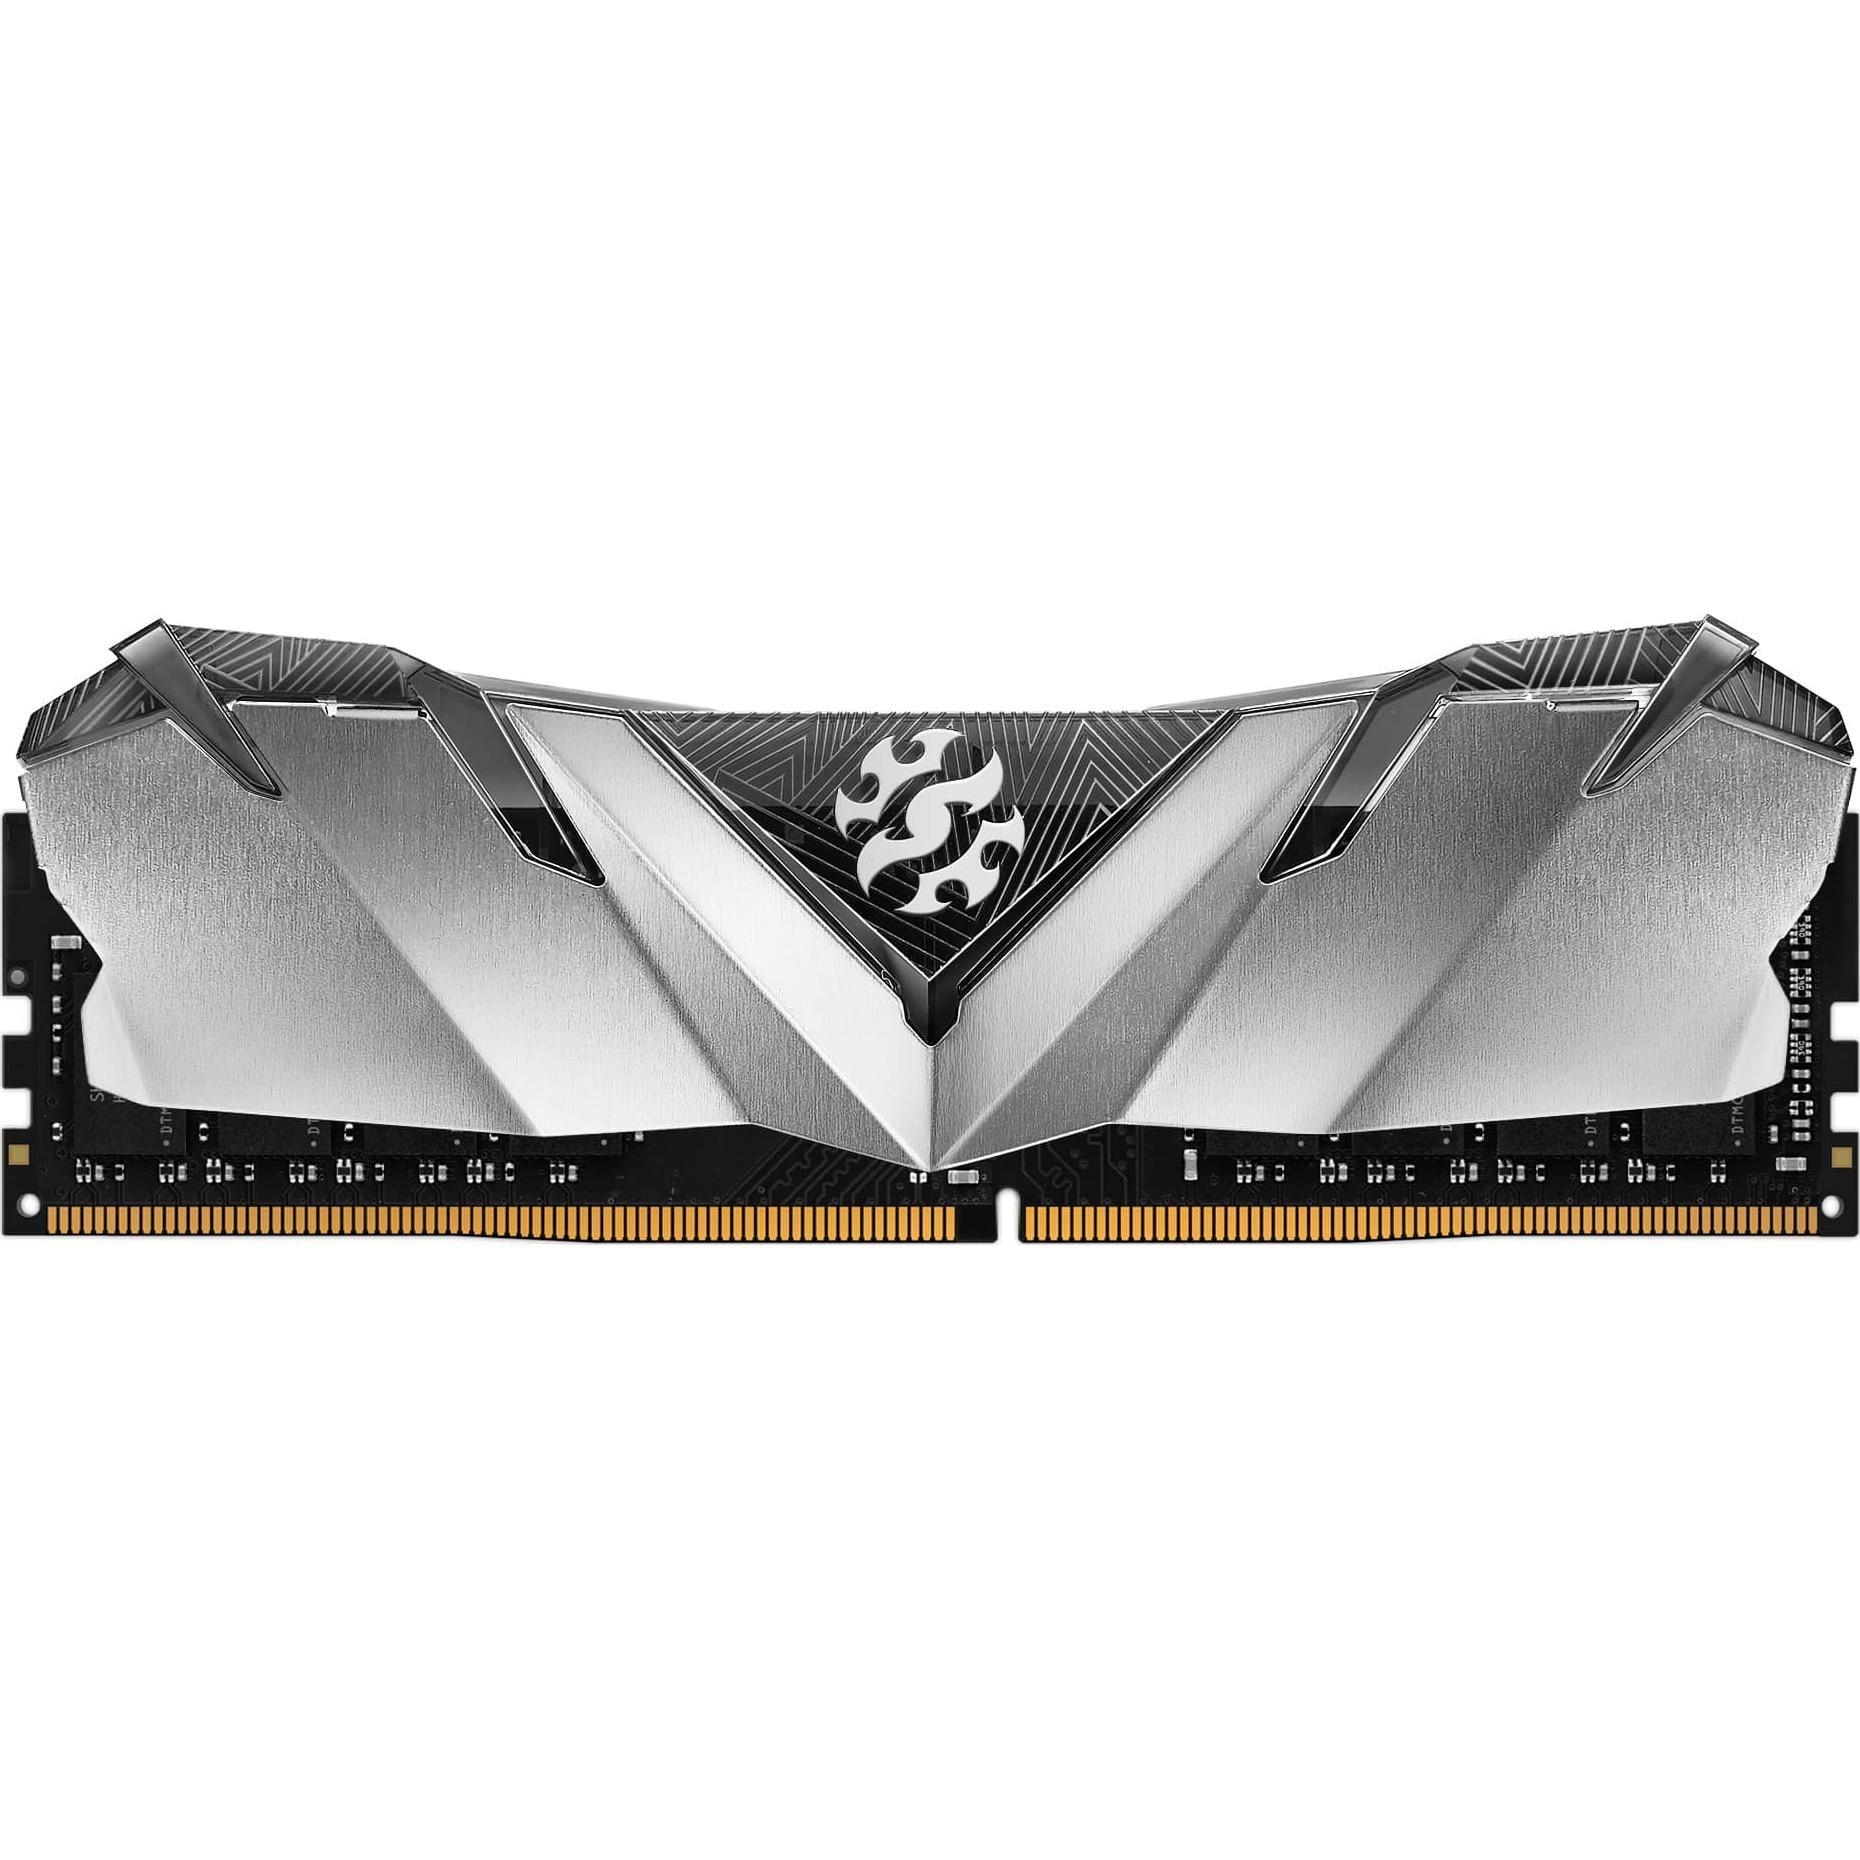 Fotografie Memorie ADATA XPG Gammix D30, 8GB, DDR4, 3200MHz, CL18